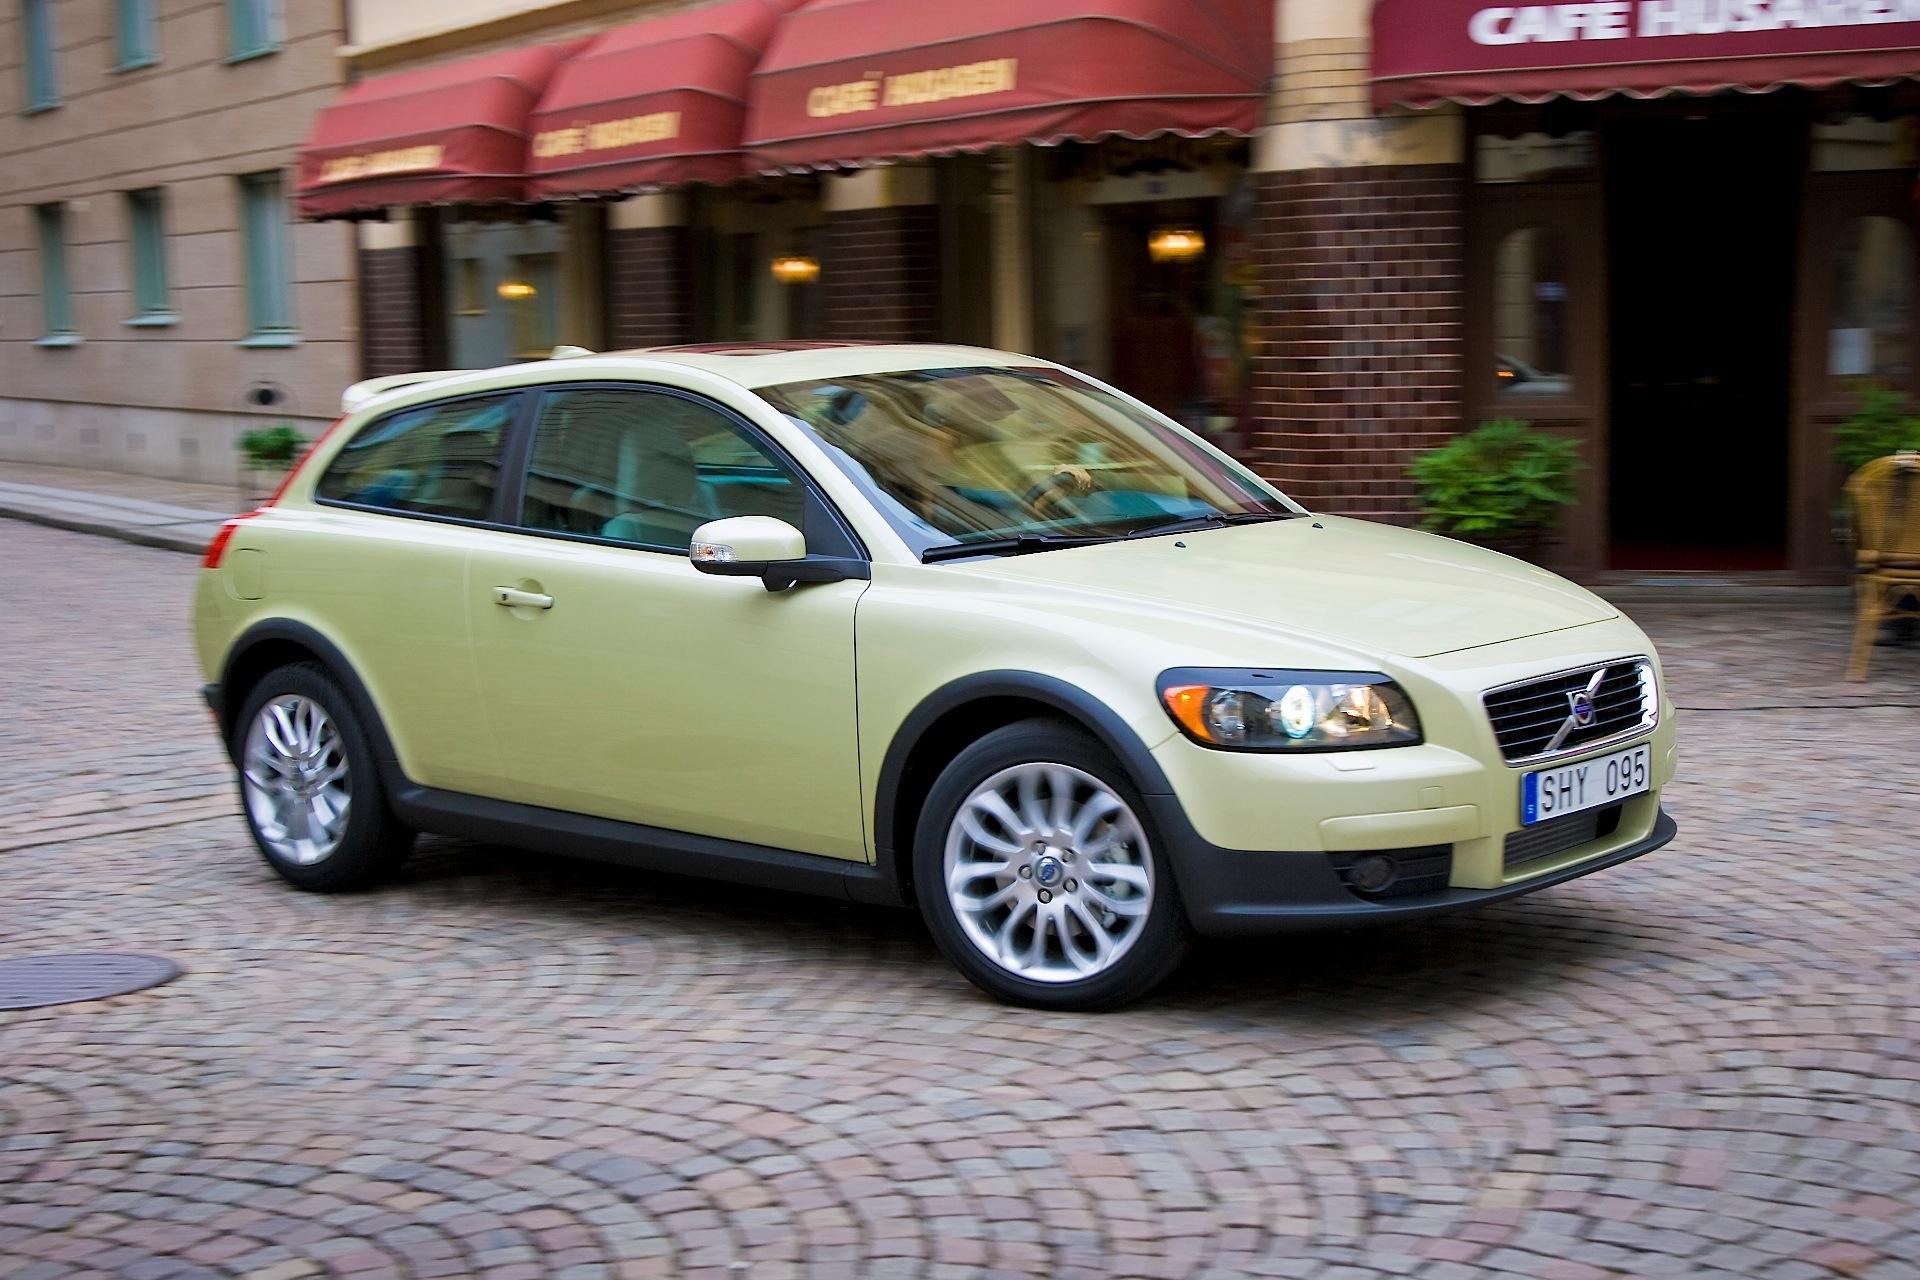 VOLVO C30 - 2006, 2007, 2008, 2009 - autoevolution